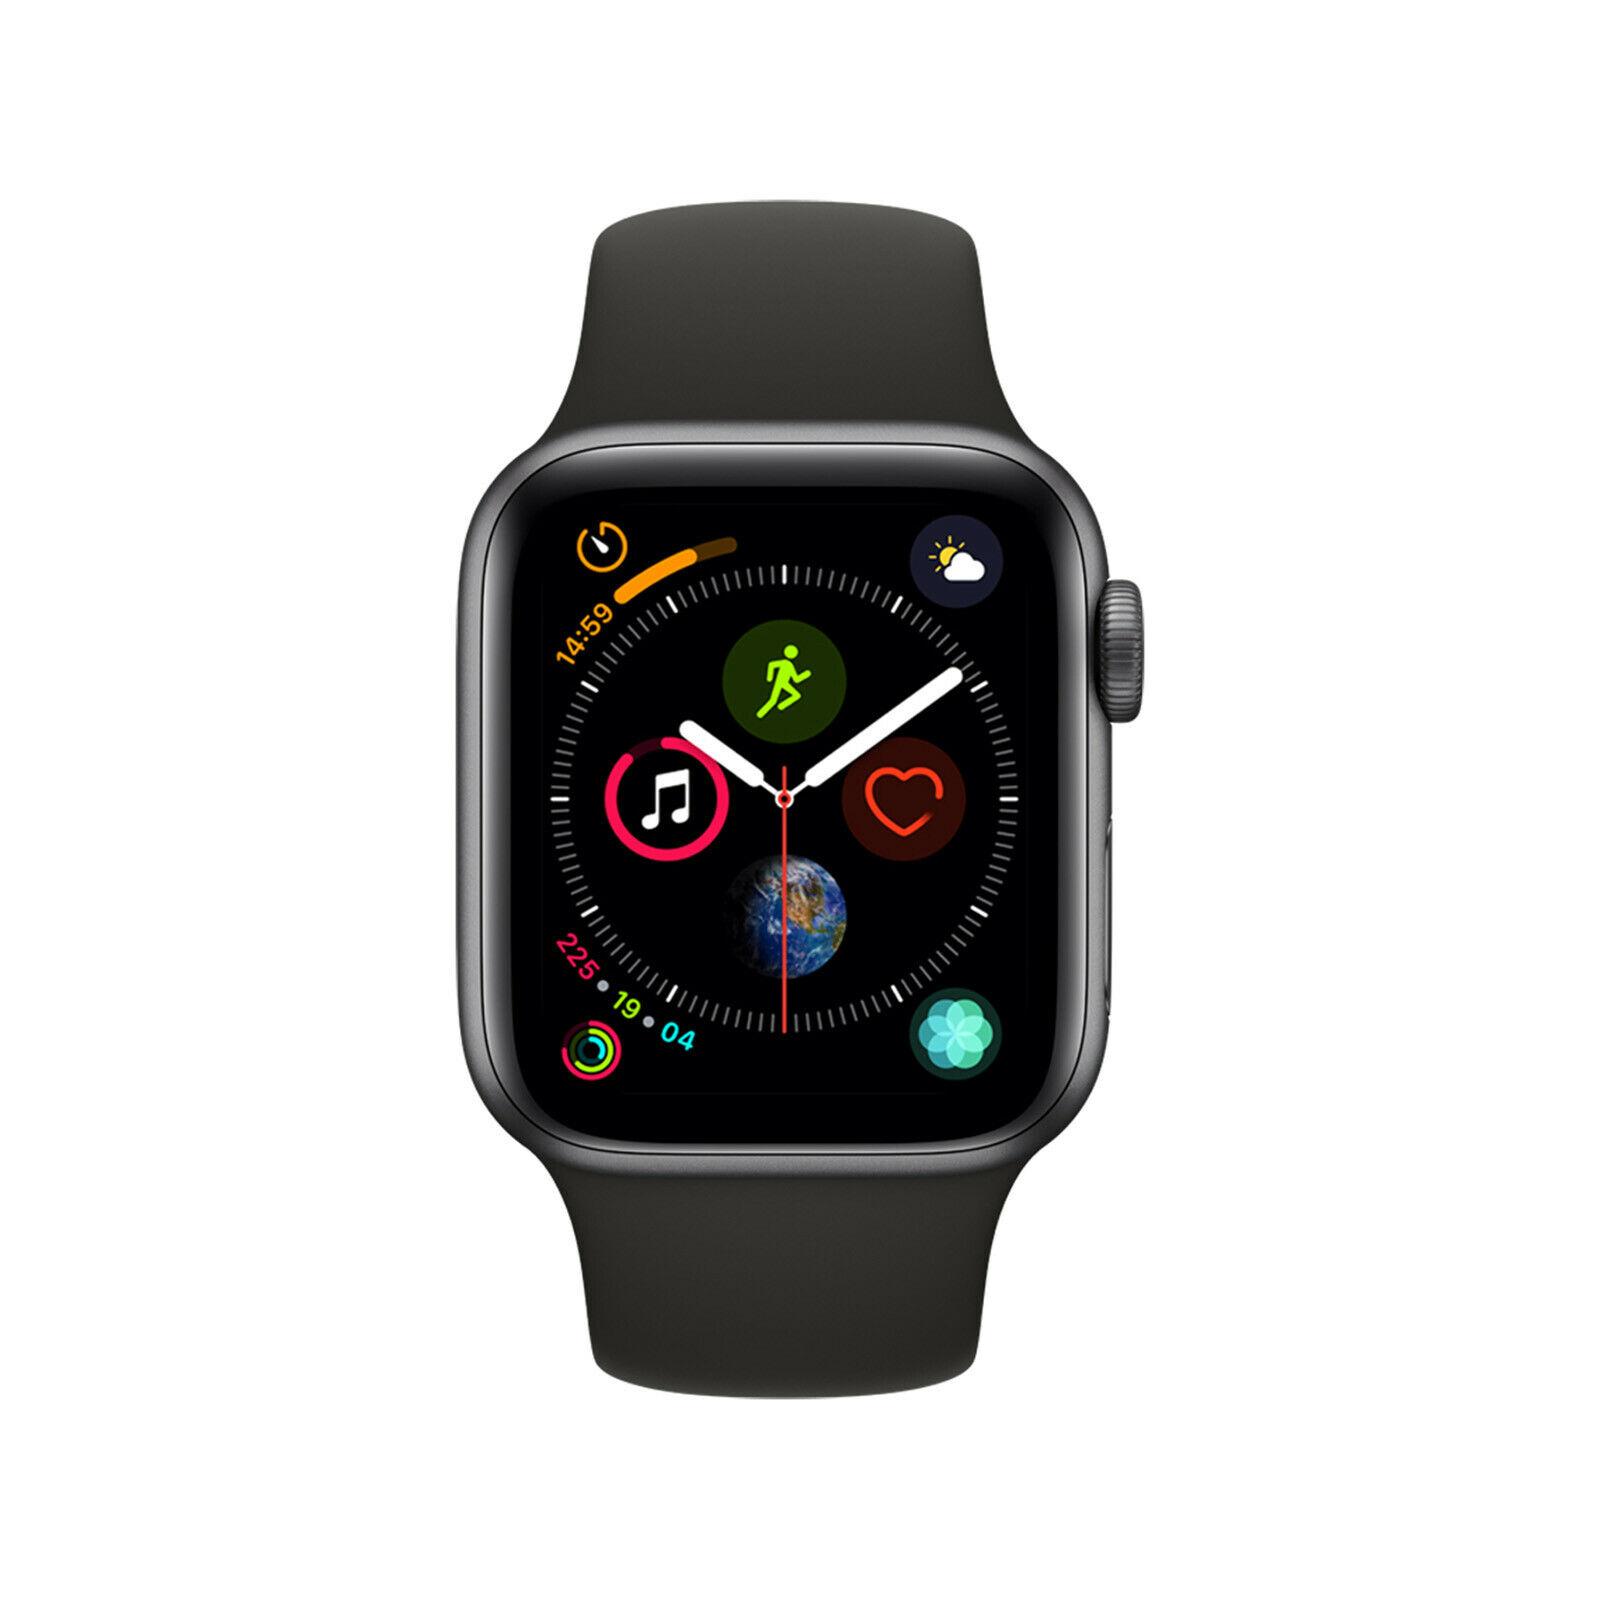 Apple Watch Series 4 40mm Space Grey & Black Sport Band - MU662LL/A - NEW (USA charger but UK adapter) £275.95 at Hitechelectronicsuk eBay